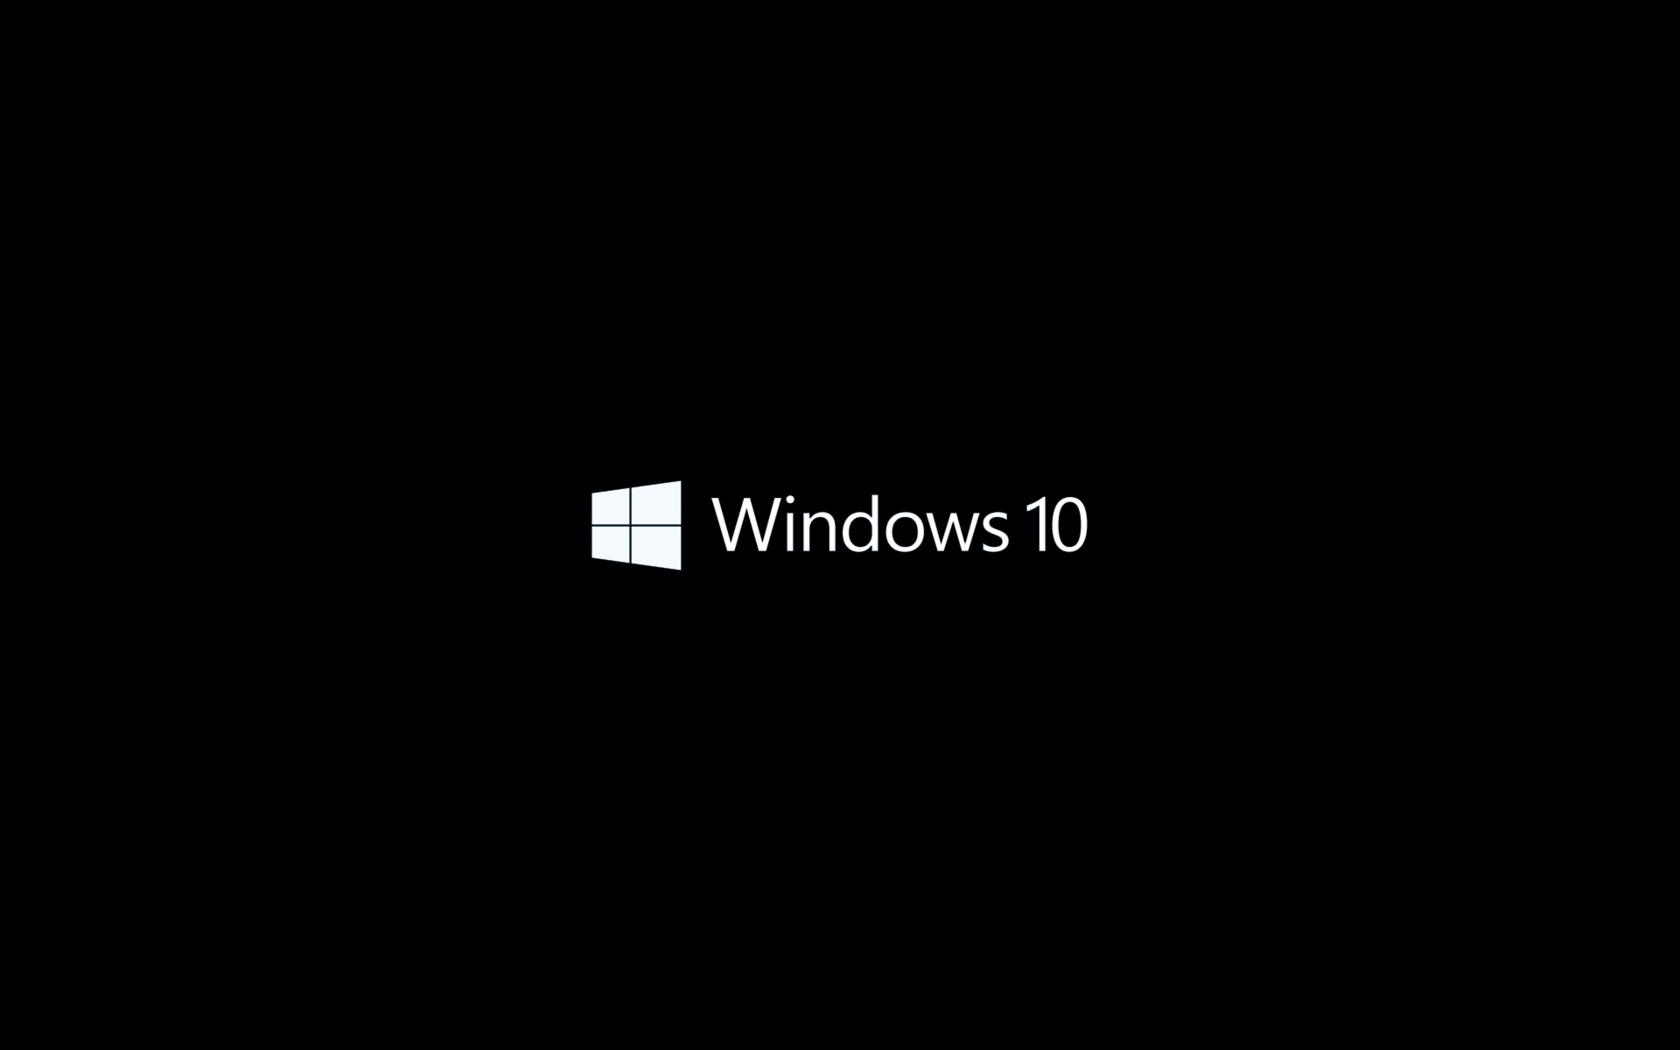 1680x1050 Windows 10 Original 3 1680x1050 Resolution Hd 4k